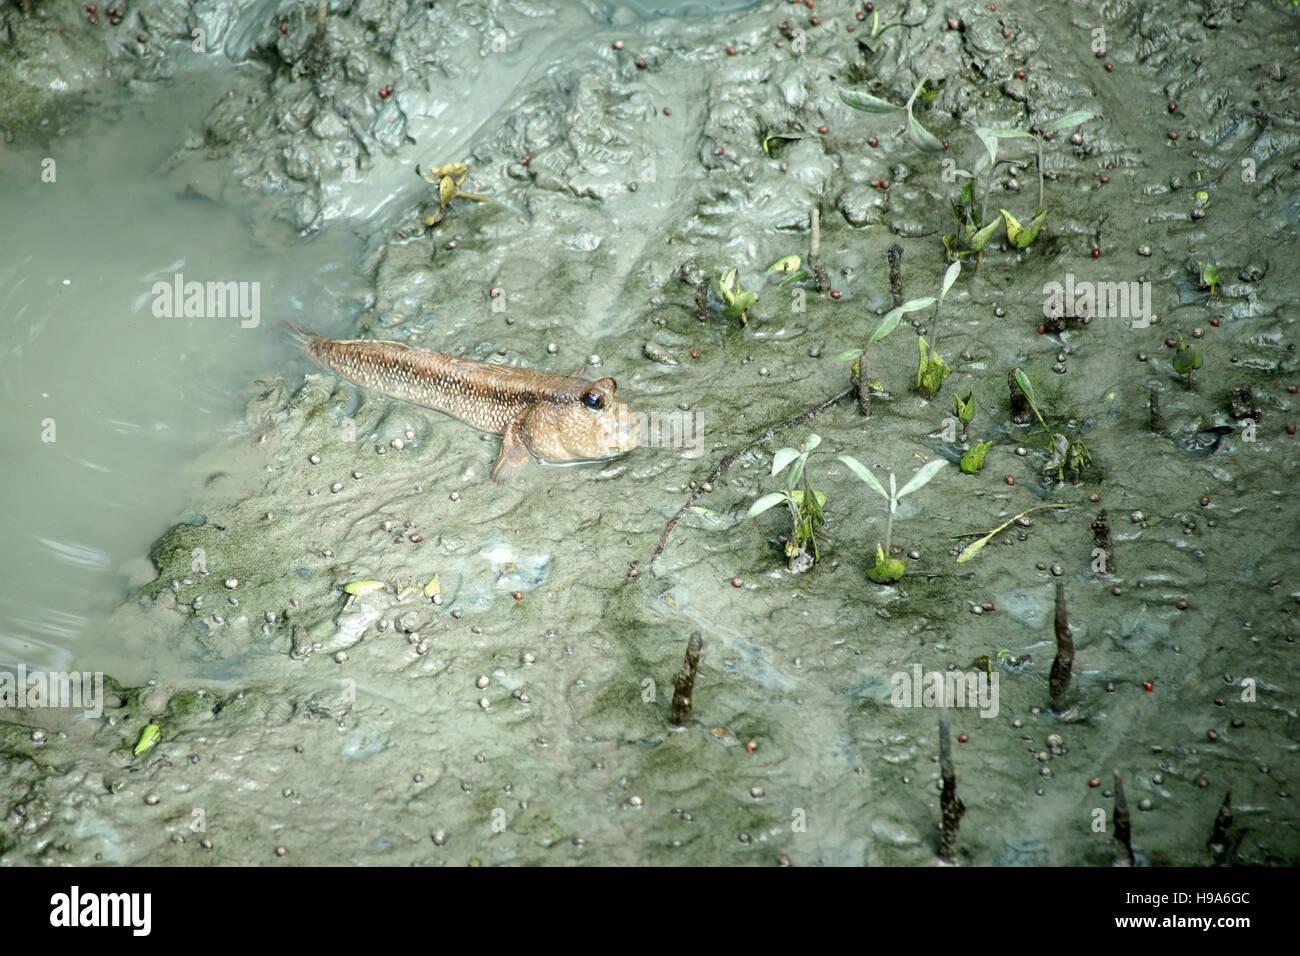 mudskipper or amphibious fish in mangrove forest - Stock Image